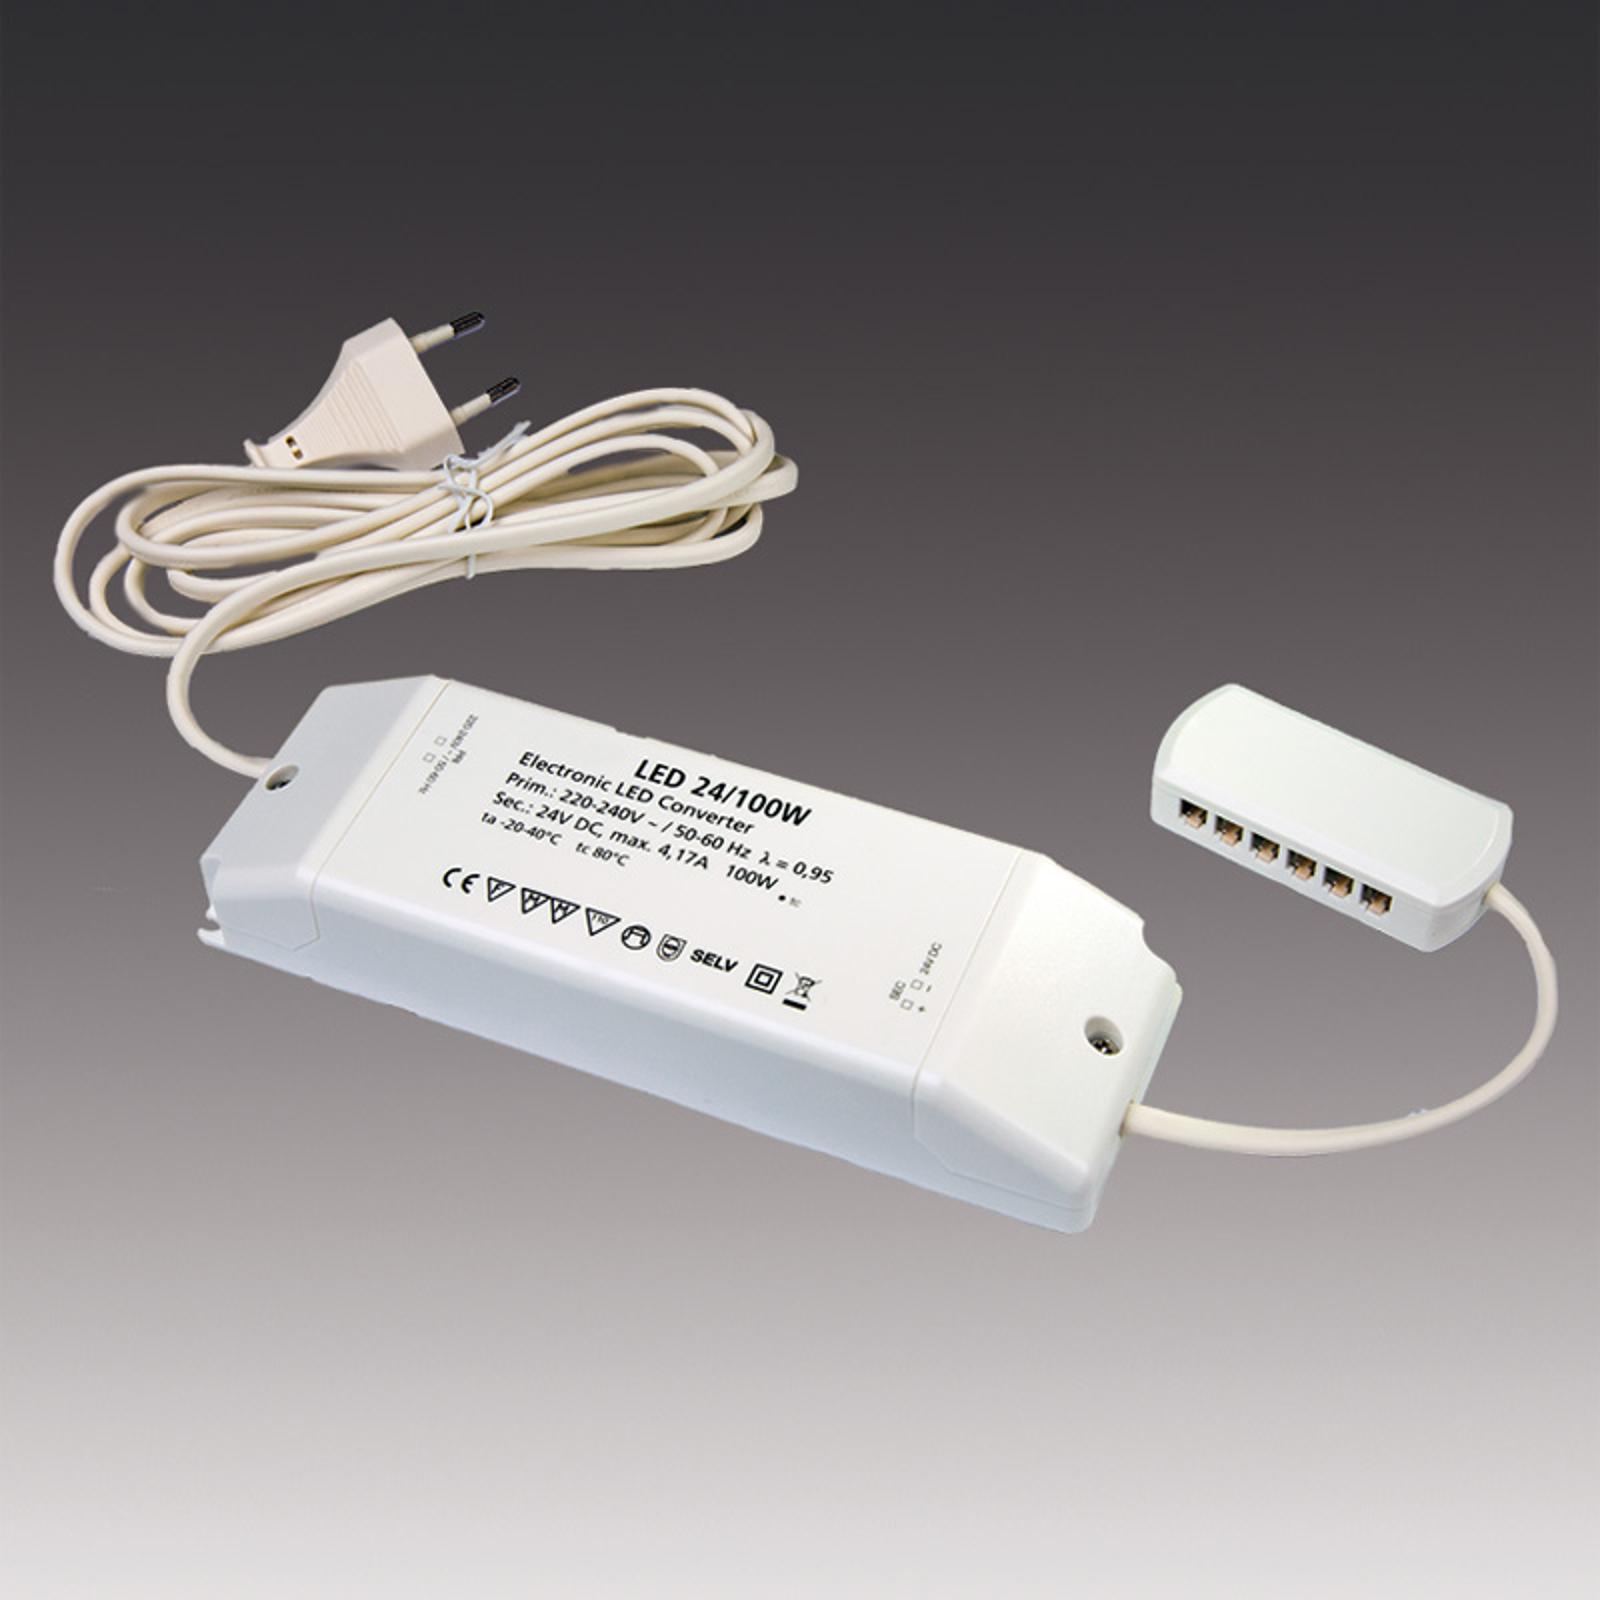 Trasformatore LED 24/100W DC 24 V